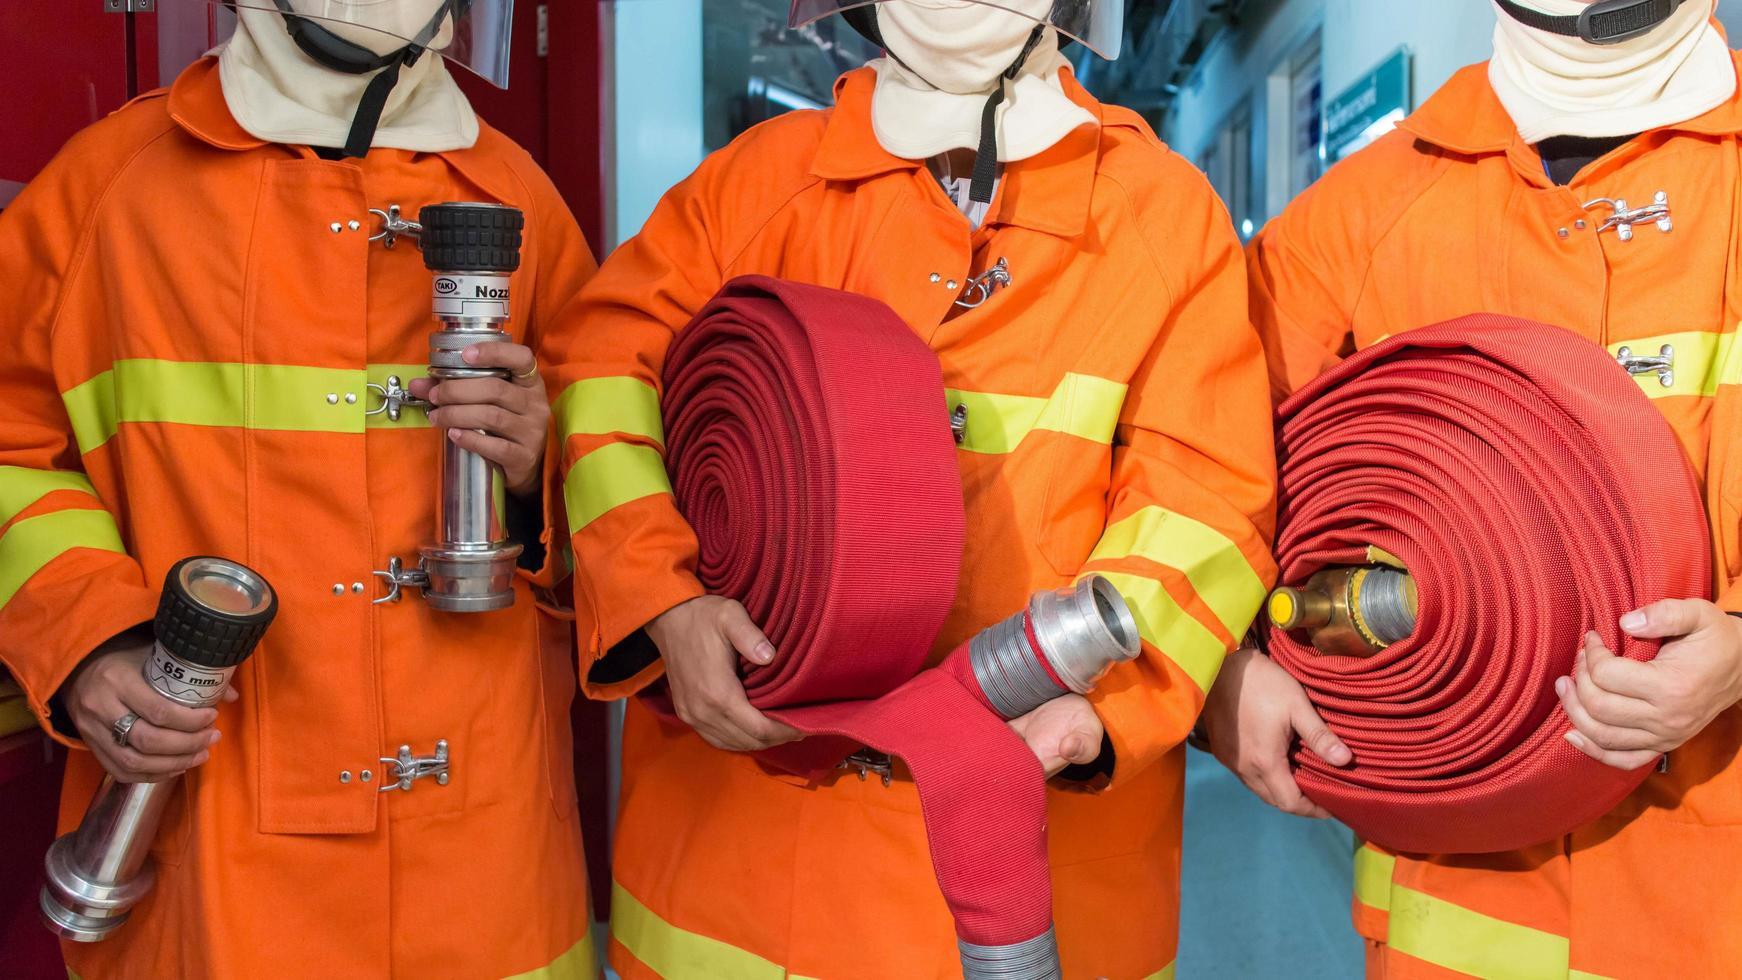 Feuerwehrmänner in Uniform foto